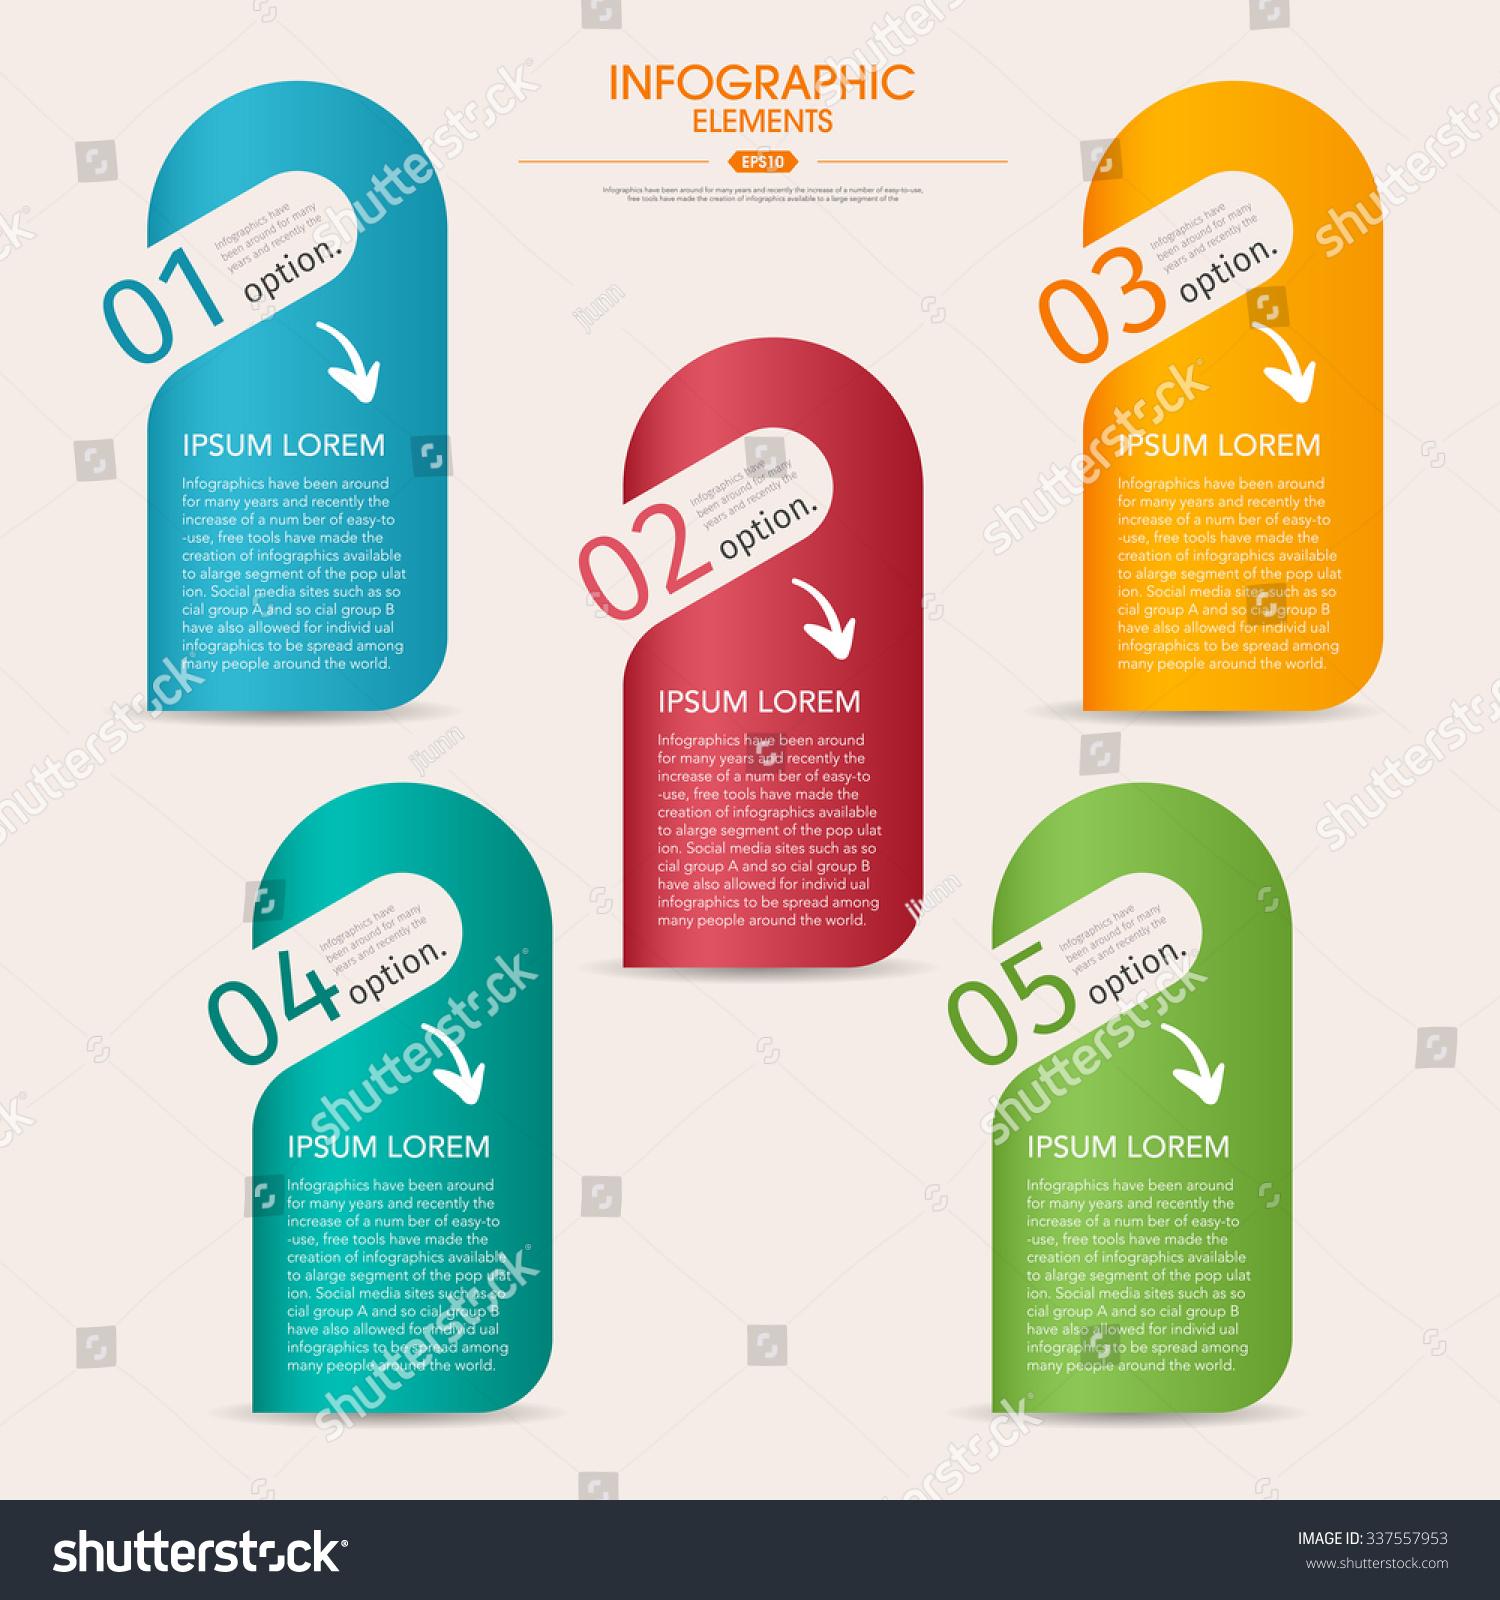 3d brochure template - vector 3d step label infographic design stock vector